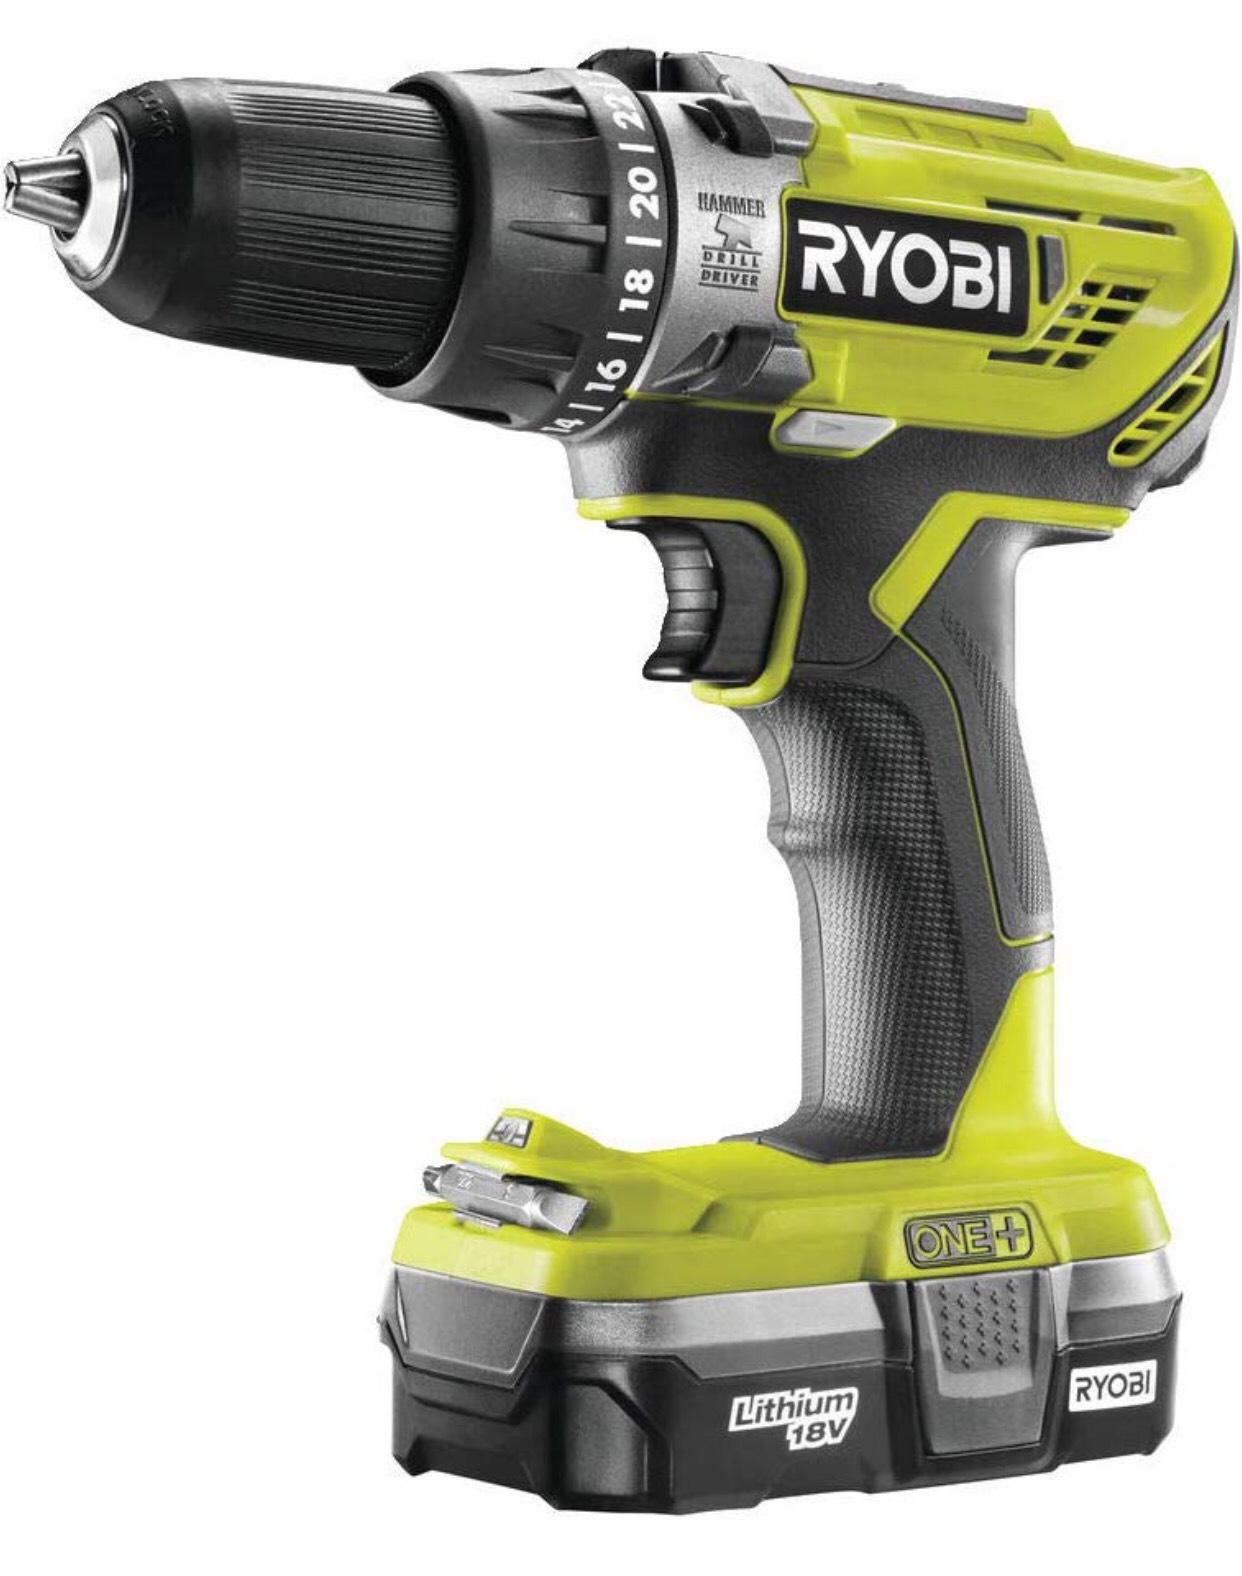 Ryobi R18PD3-113G 18 V ONE+ Cordless Combi Drill Starter Kit (1 x 1.3 Ah) £67.99 at Amazon